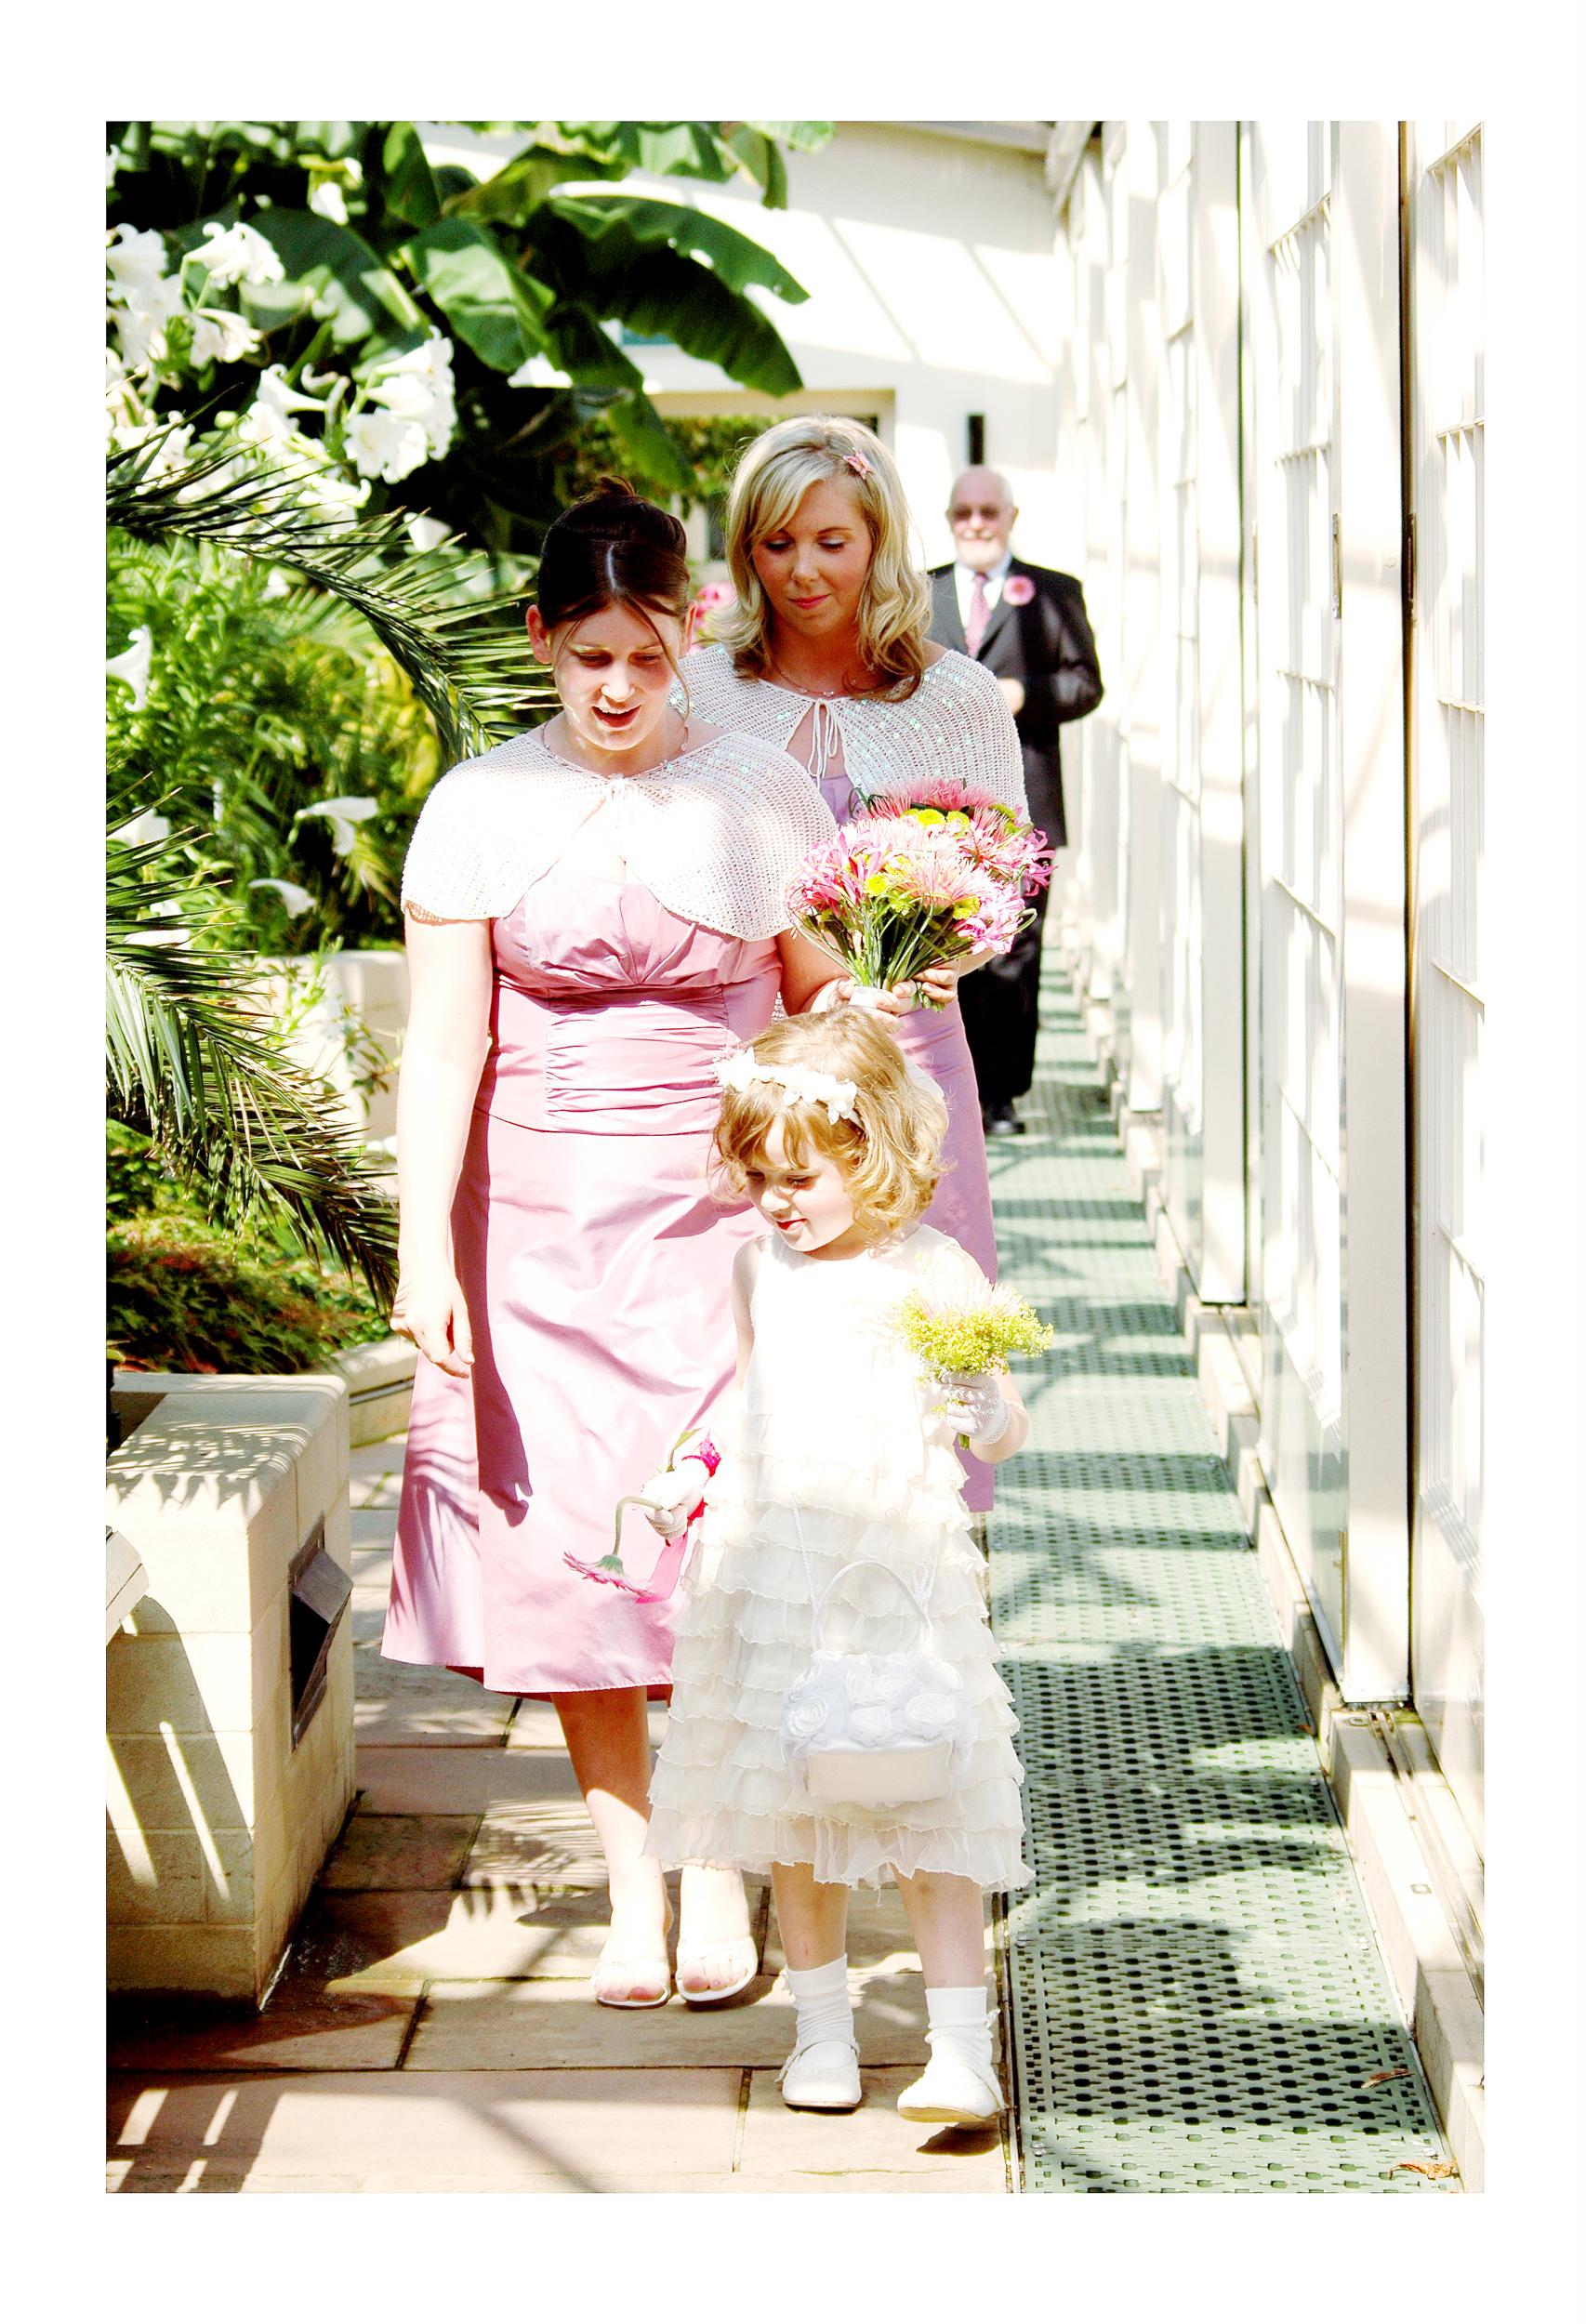 REPORTAGE-WEDDING-PHOTOGRAPHY-SET-UK-6.jpg